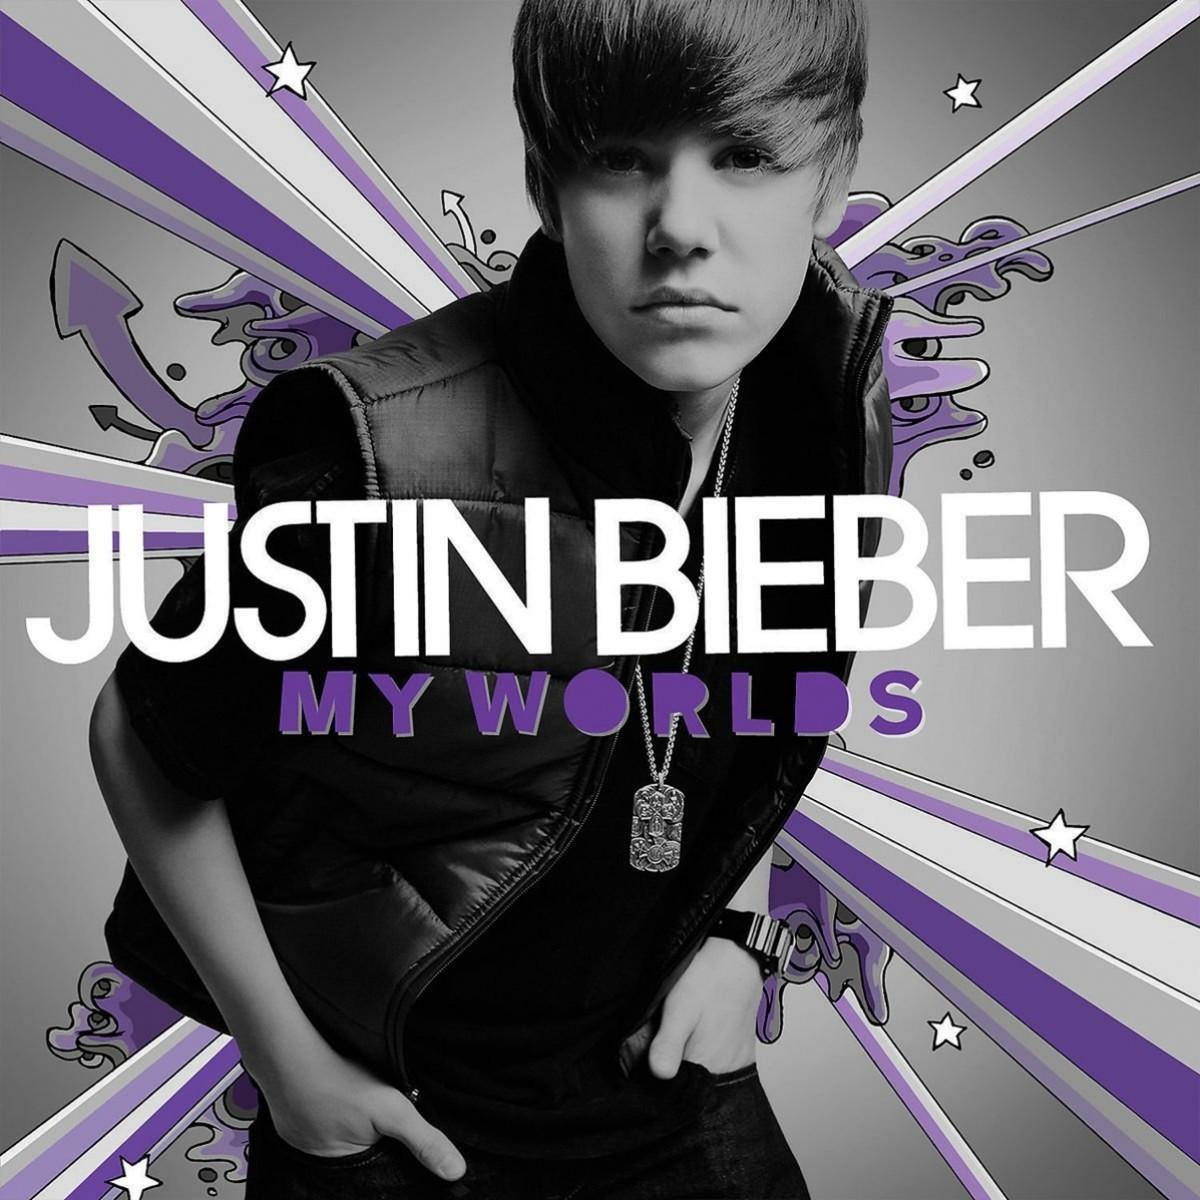 Justin Bieber My World Album Cover